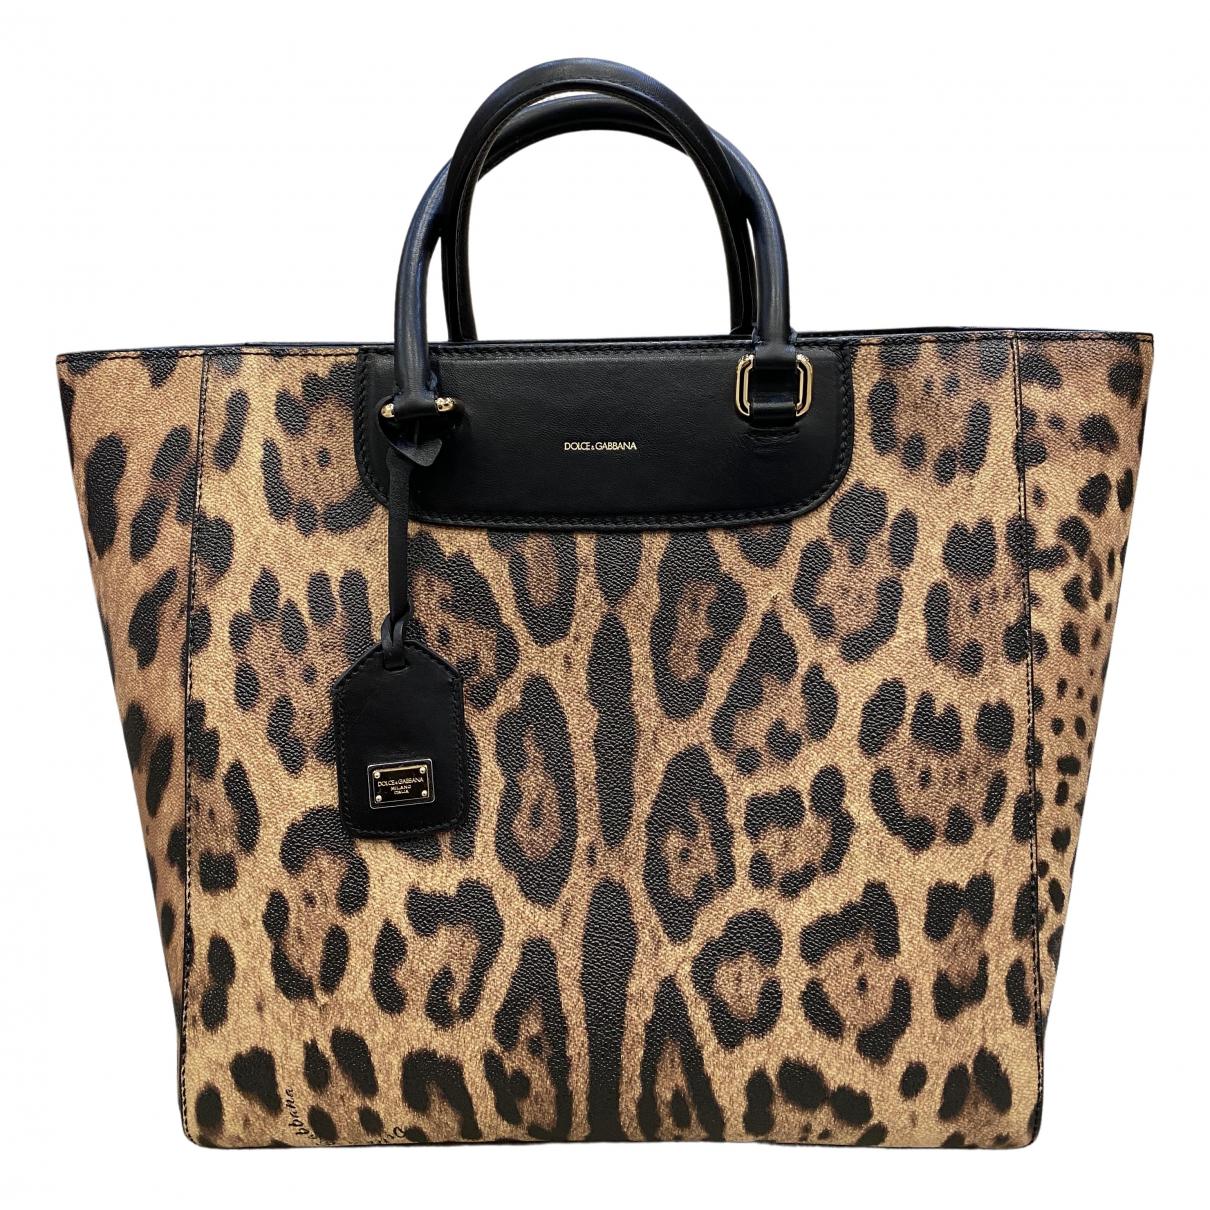 Dolce & Gabbana N Brown Cloth Handbag for Women